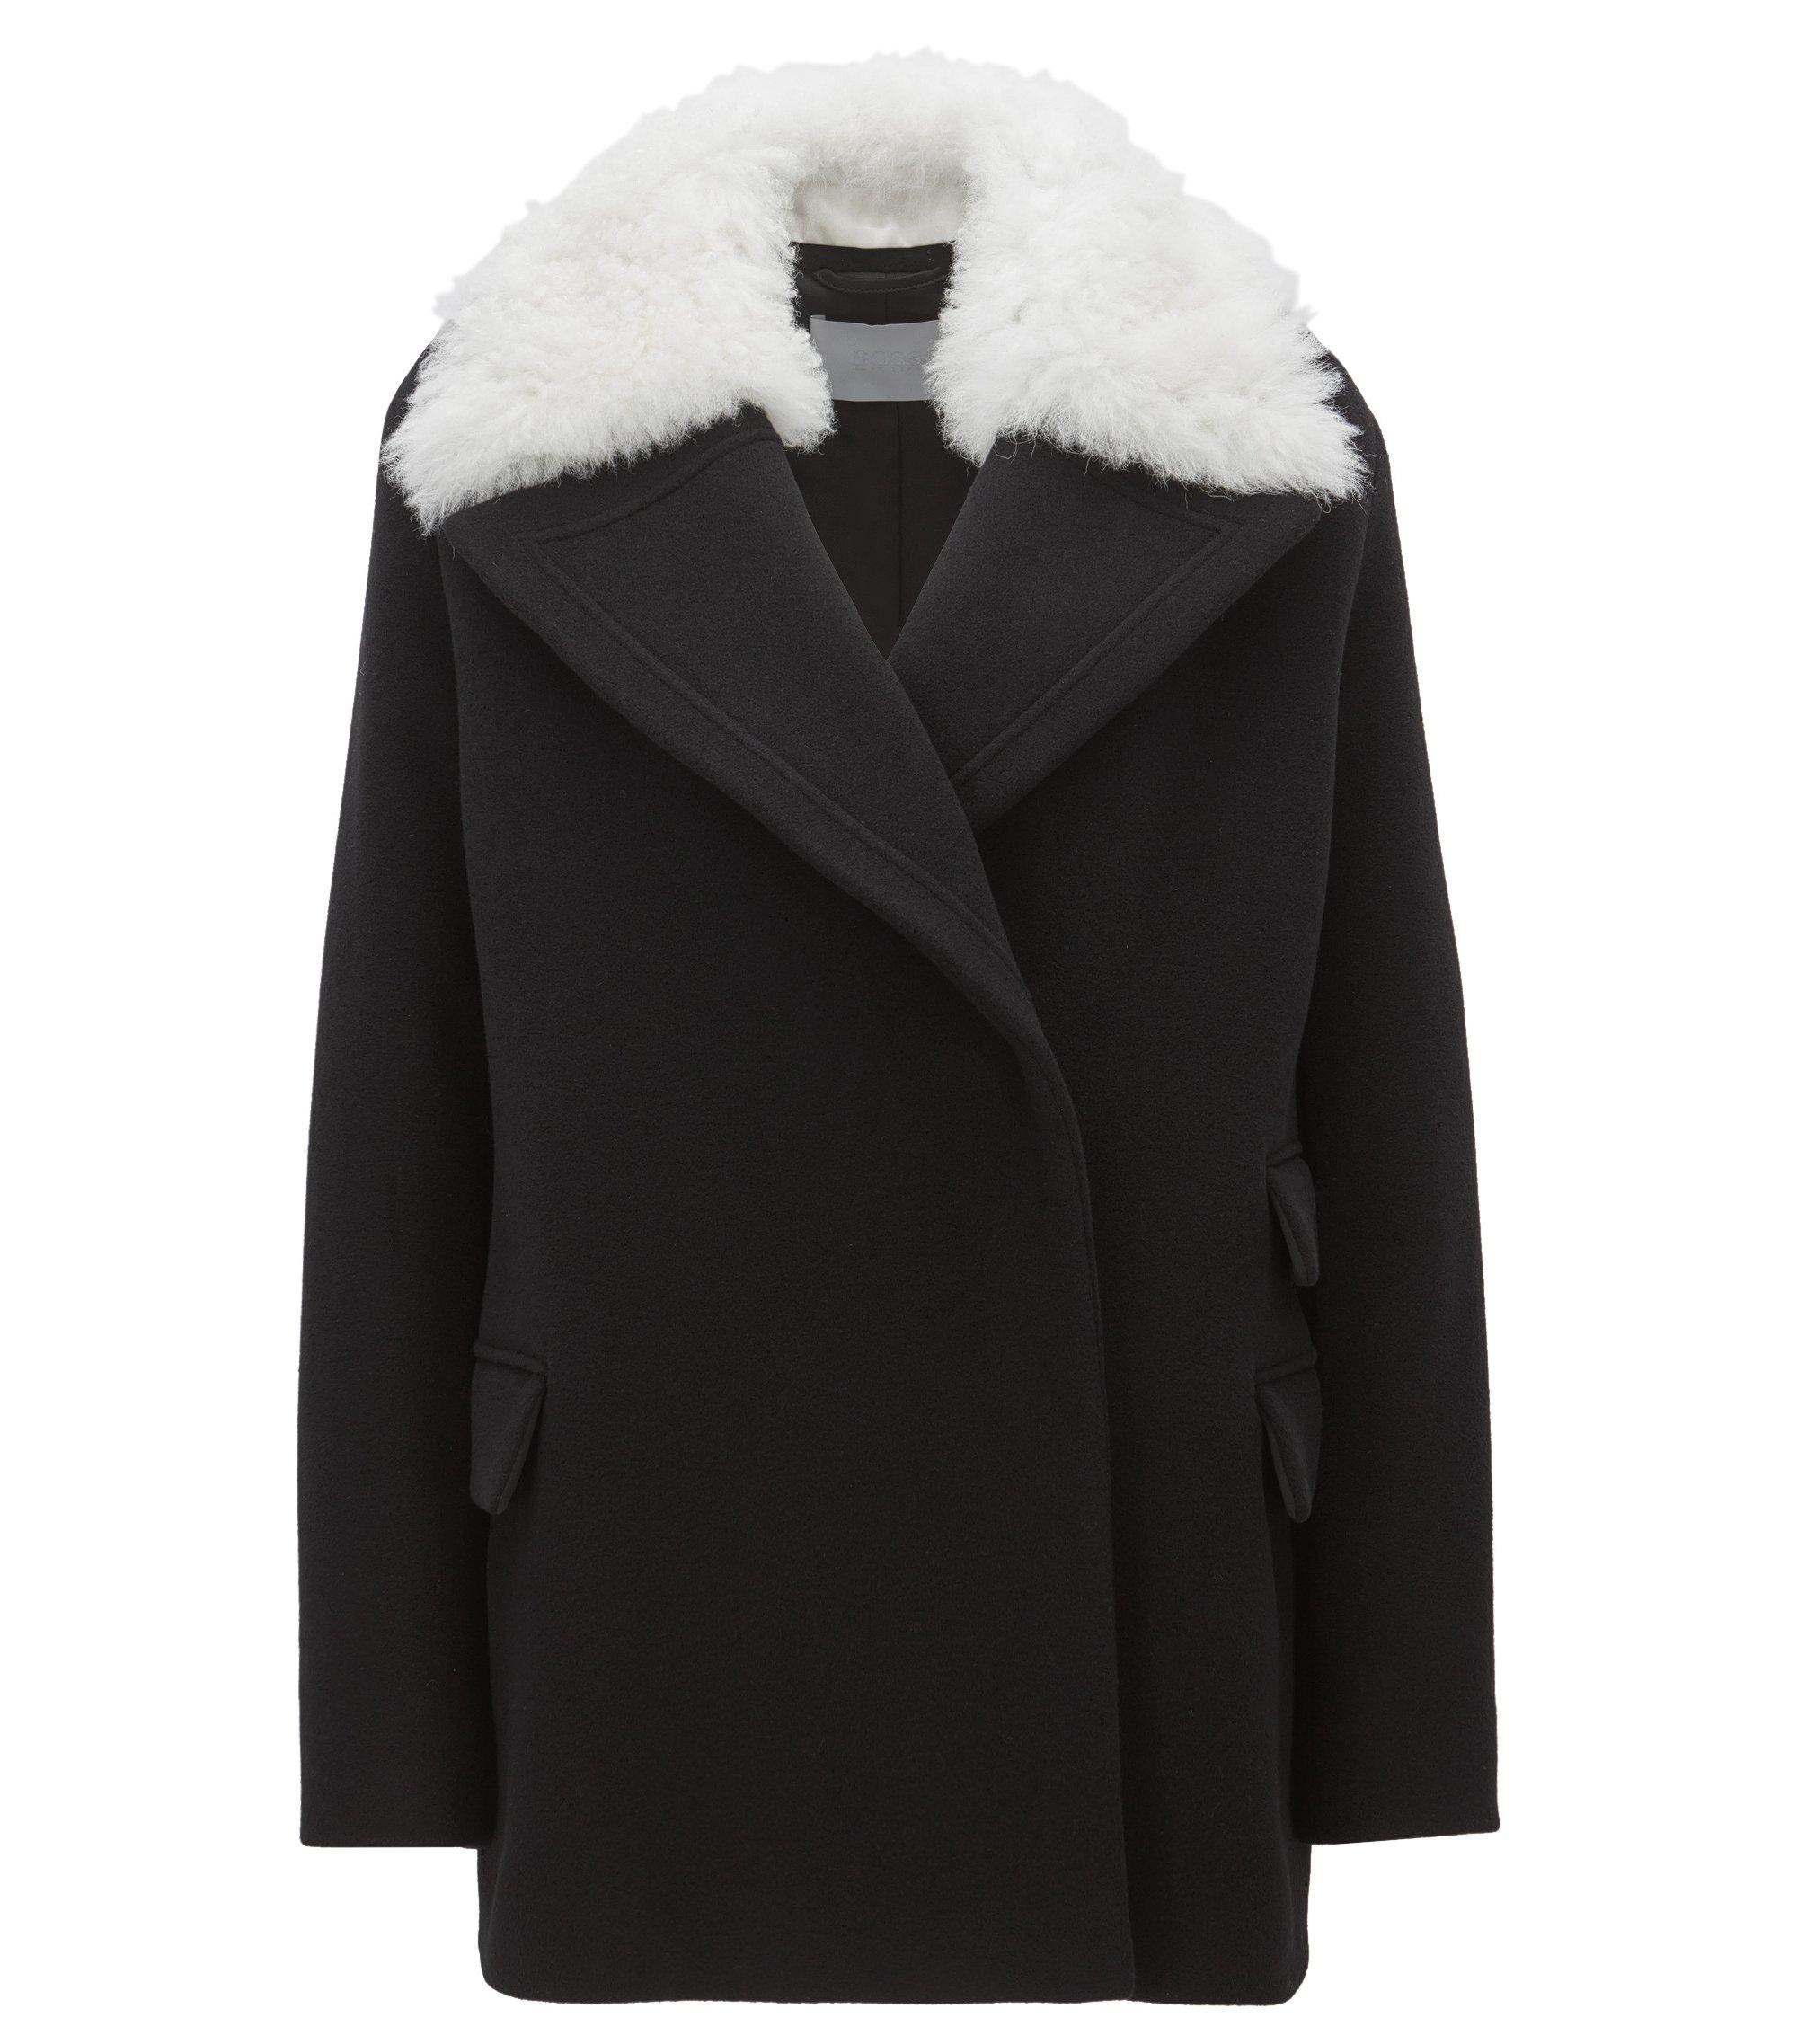 Relaxed-Fit Mantel aus Woll-Mix mit Kaschmir mit abnehmbarem Lammfellkragen, Schwarz